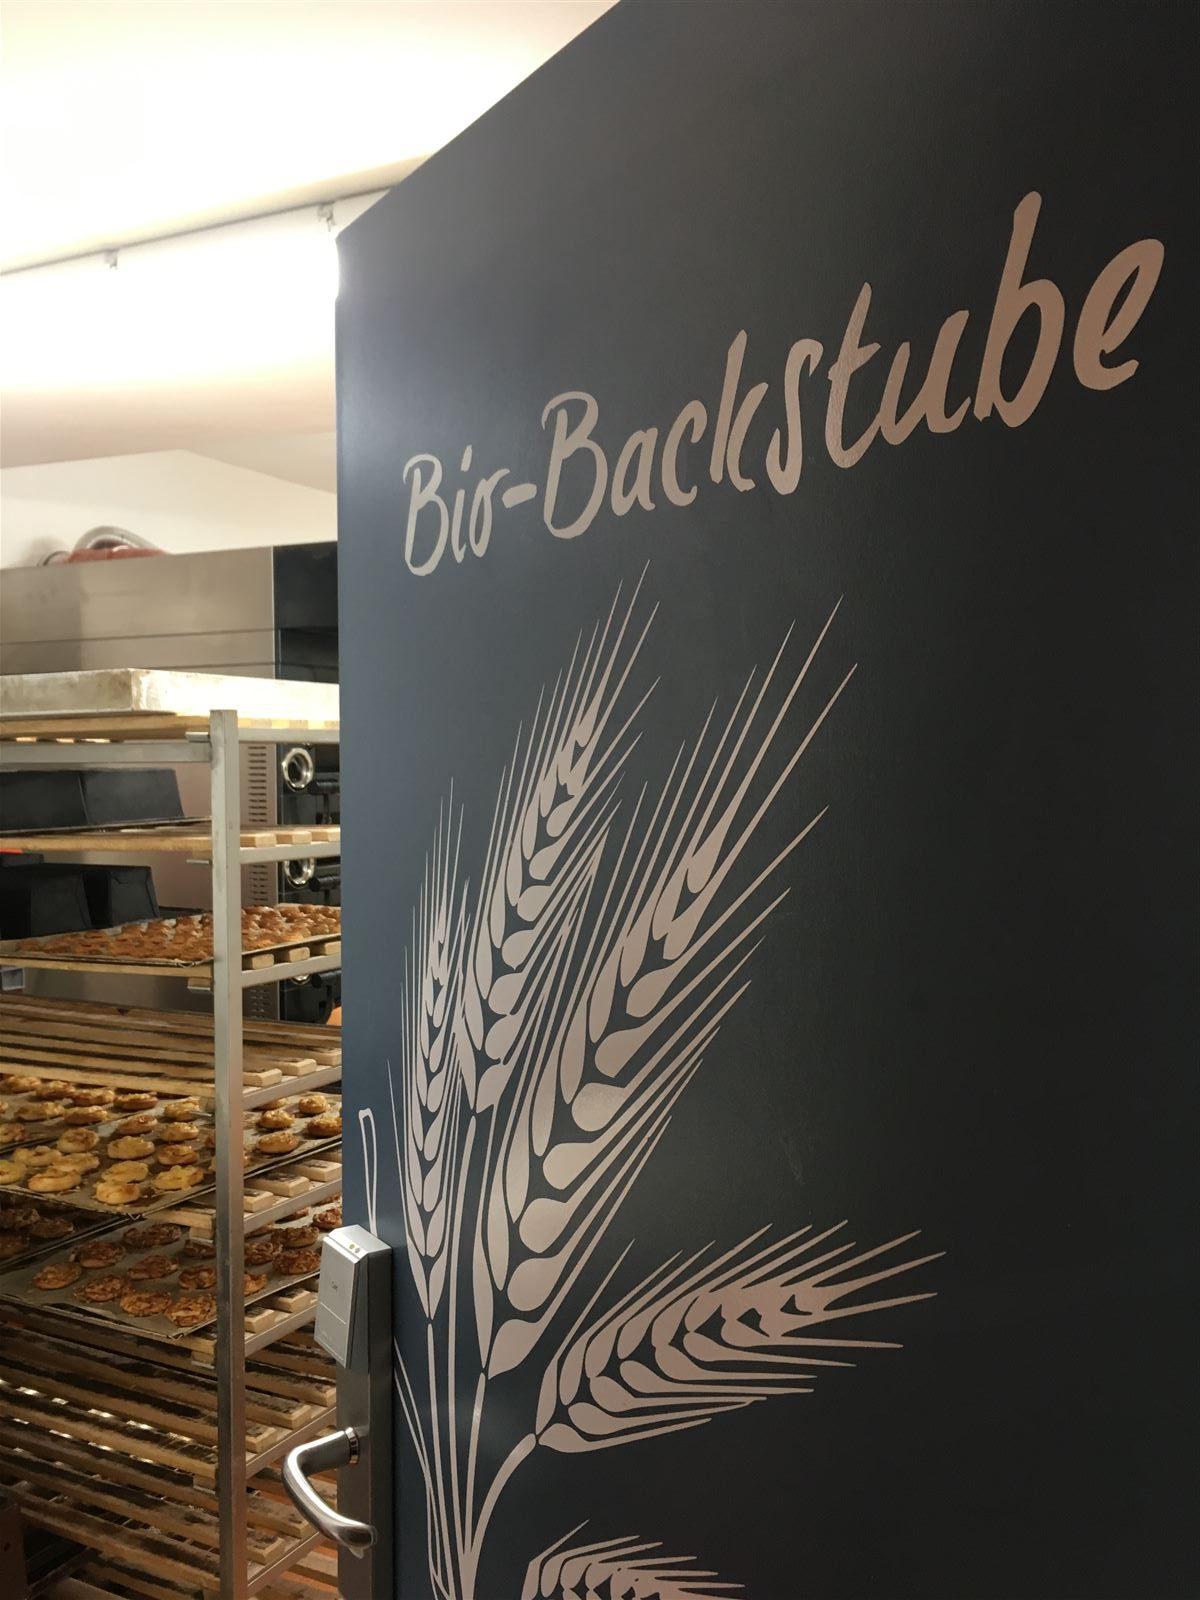 Zeulenroda - Bio-Seehotel - Bäckerei